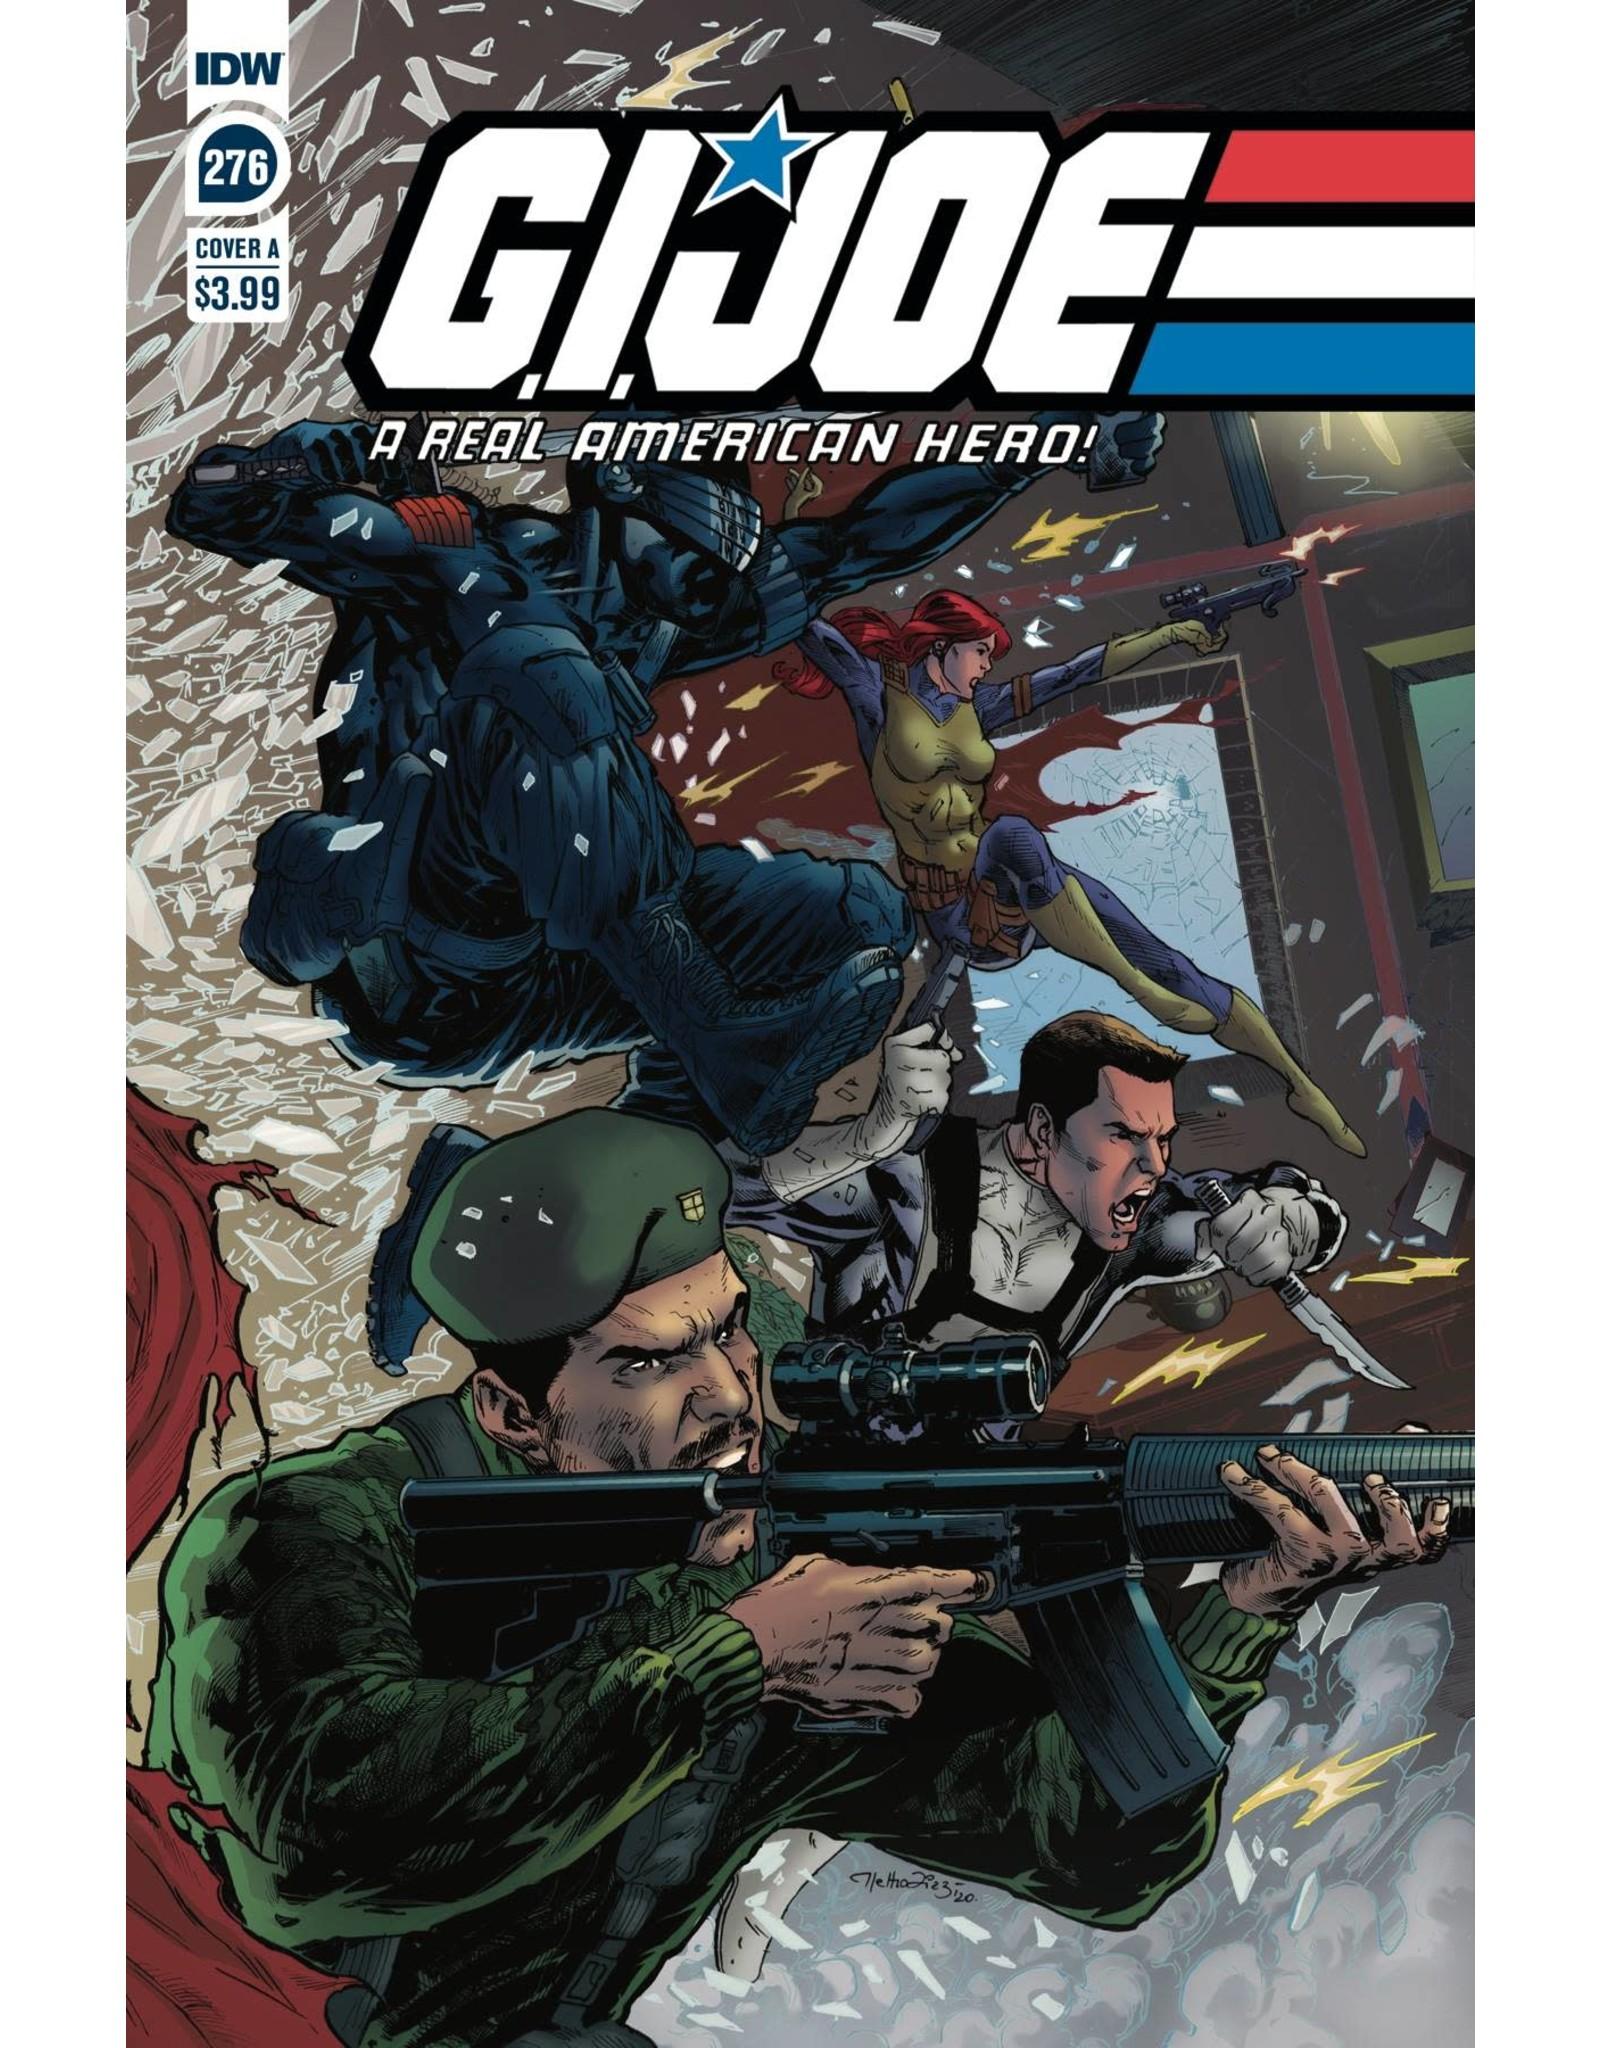 IDW PUBLISHING GI JOE A REAL AMERICAN HERO #276 CVR A DIAZ